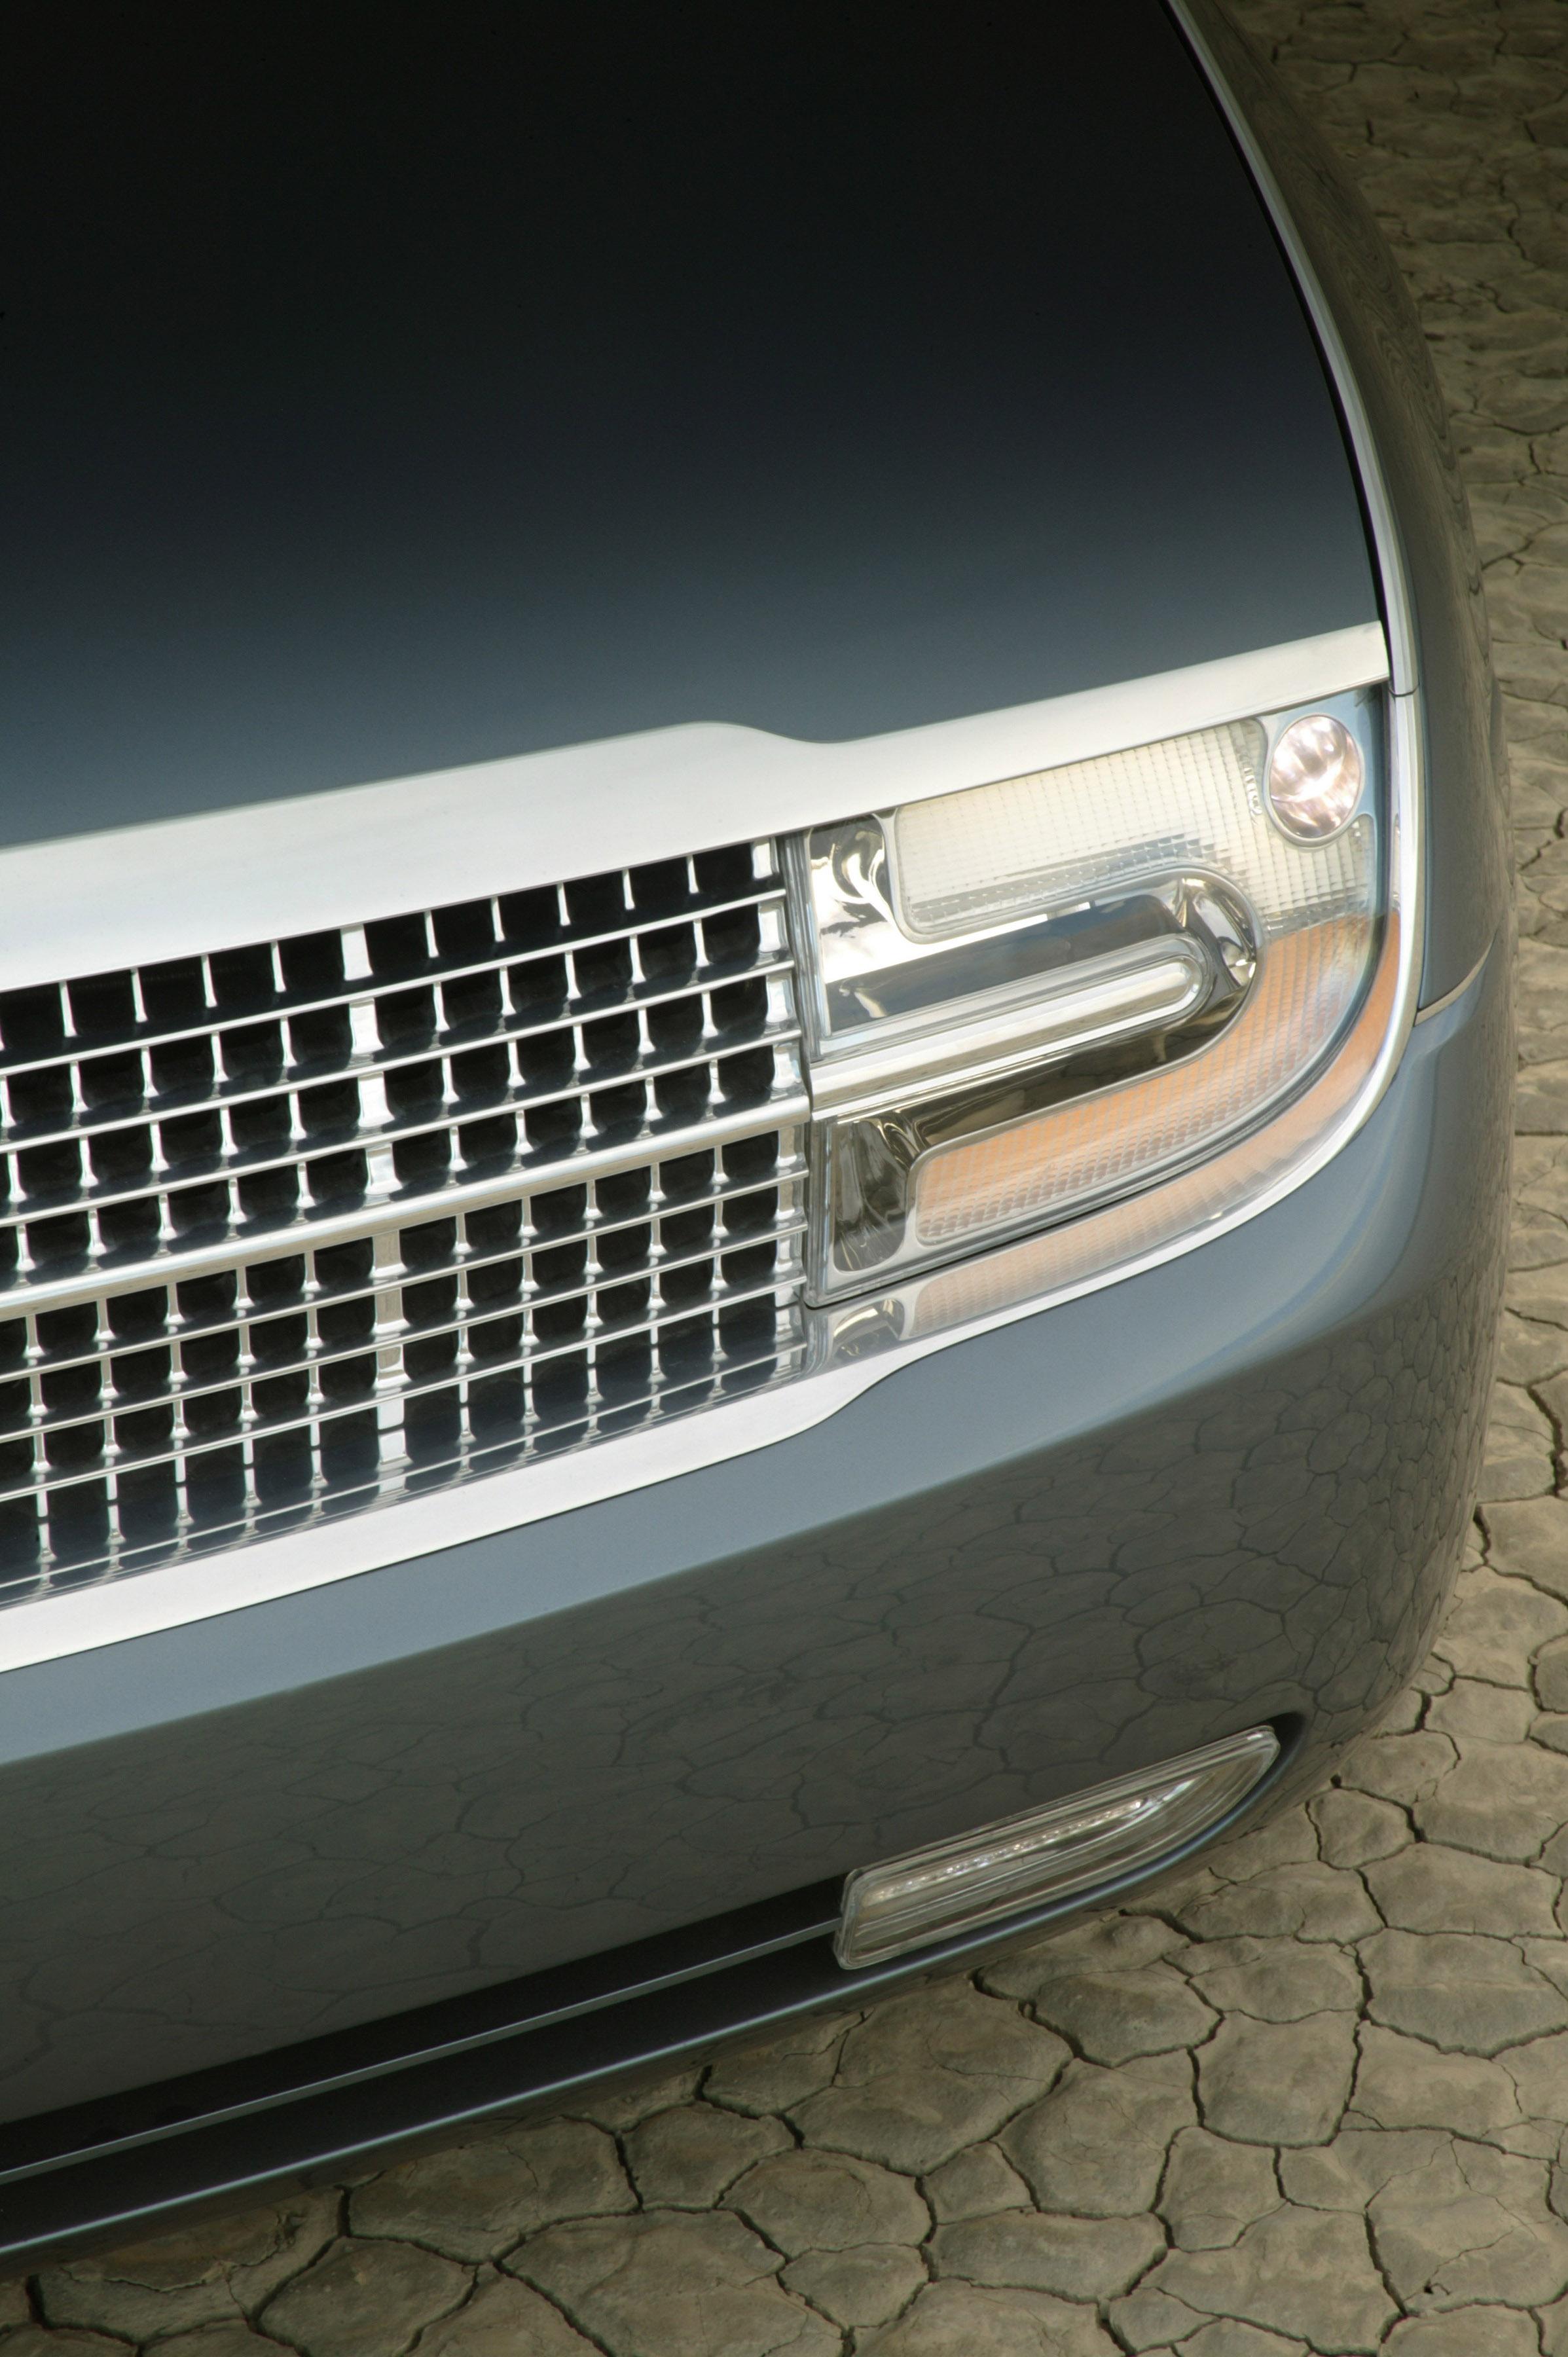 https://www.automobilesreview.com/gallery/lincoln-mark-x-concept/lincoln-mark-x-concept-12.jpg